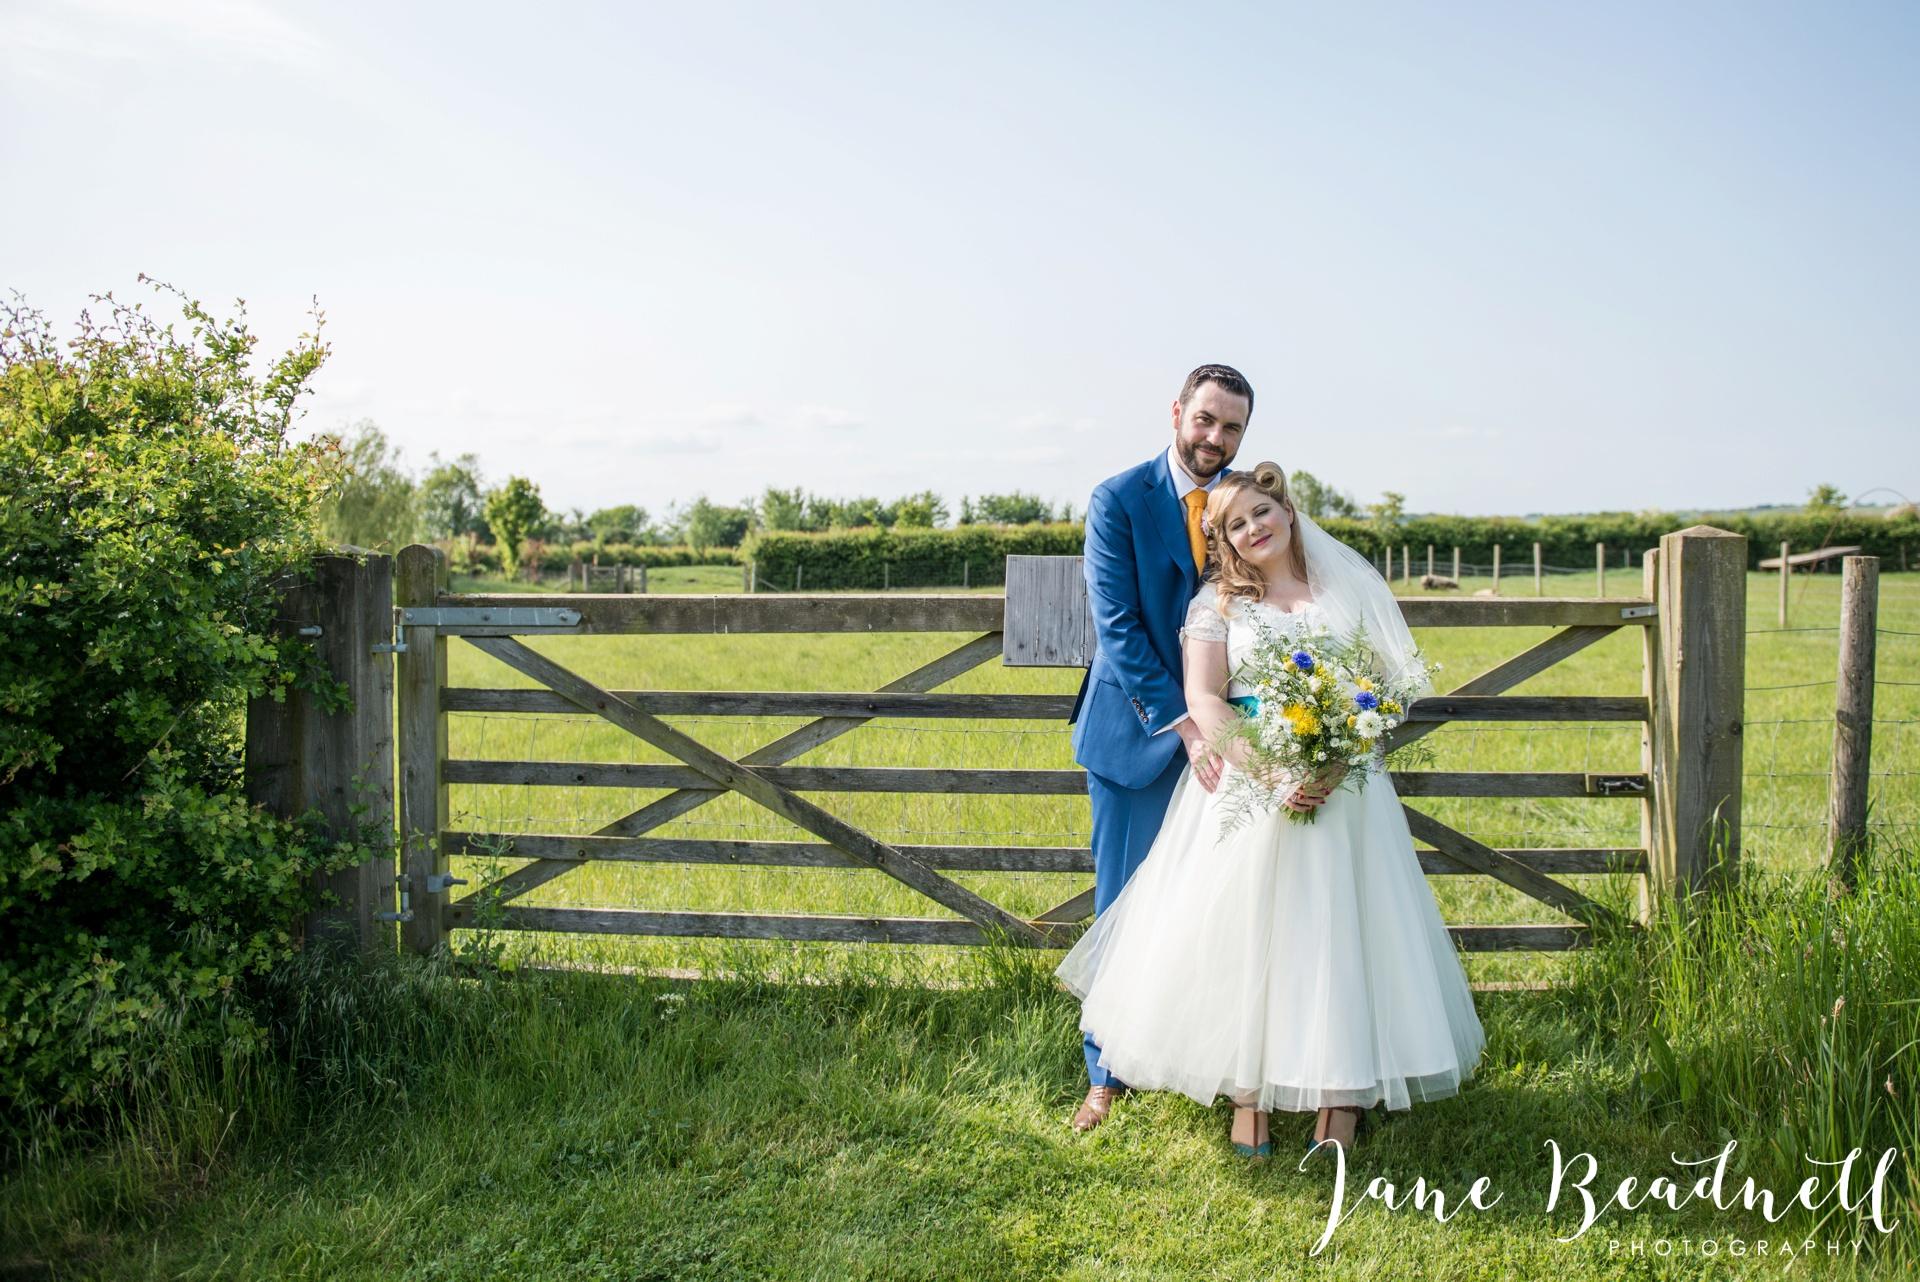 South Farm Wedding photography Hertfordshire by Jane Beadnell Photography fine art wedding photographer_0125